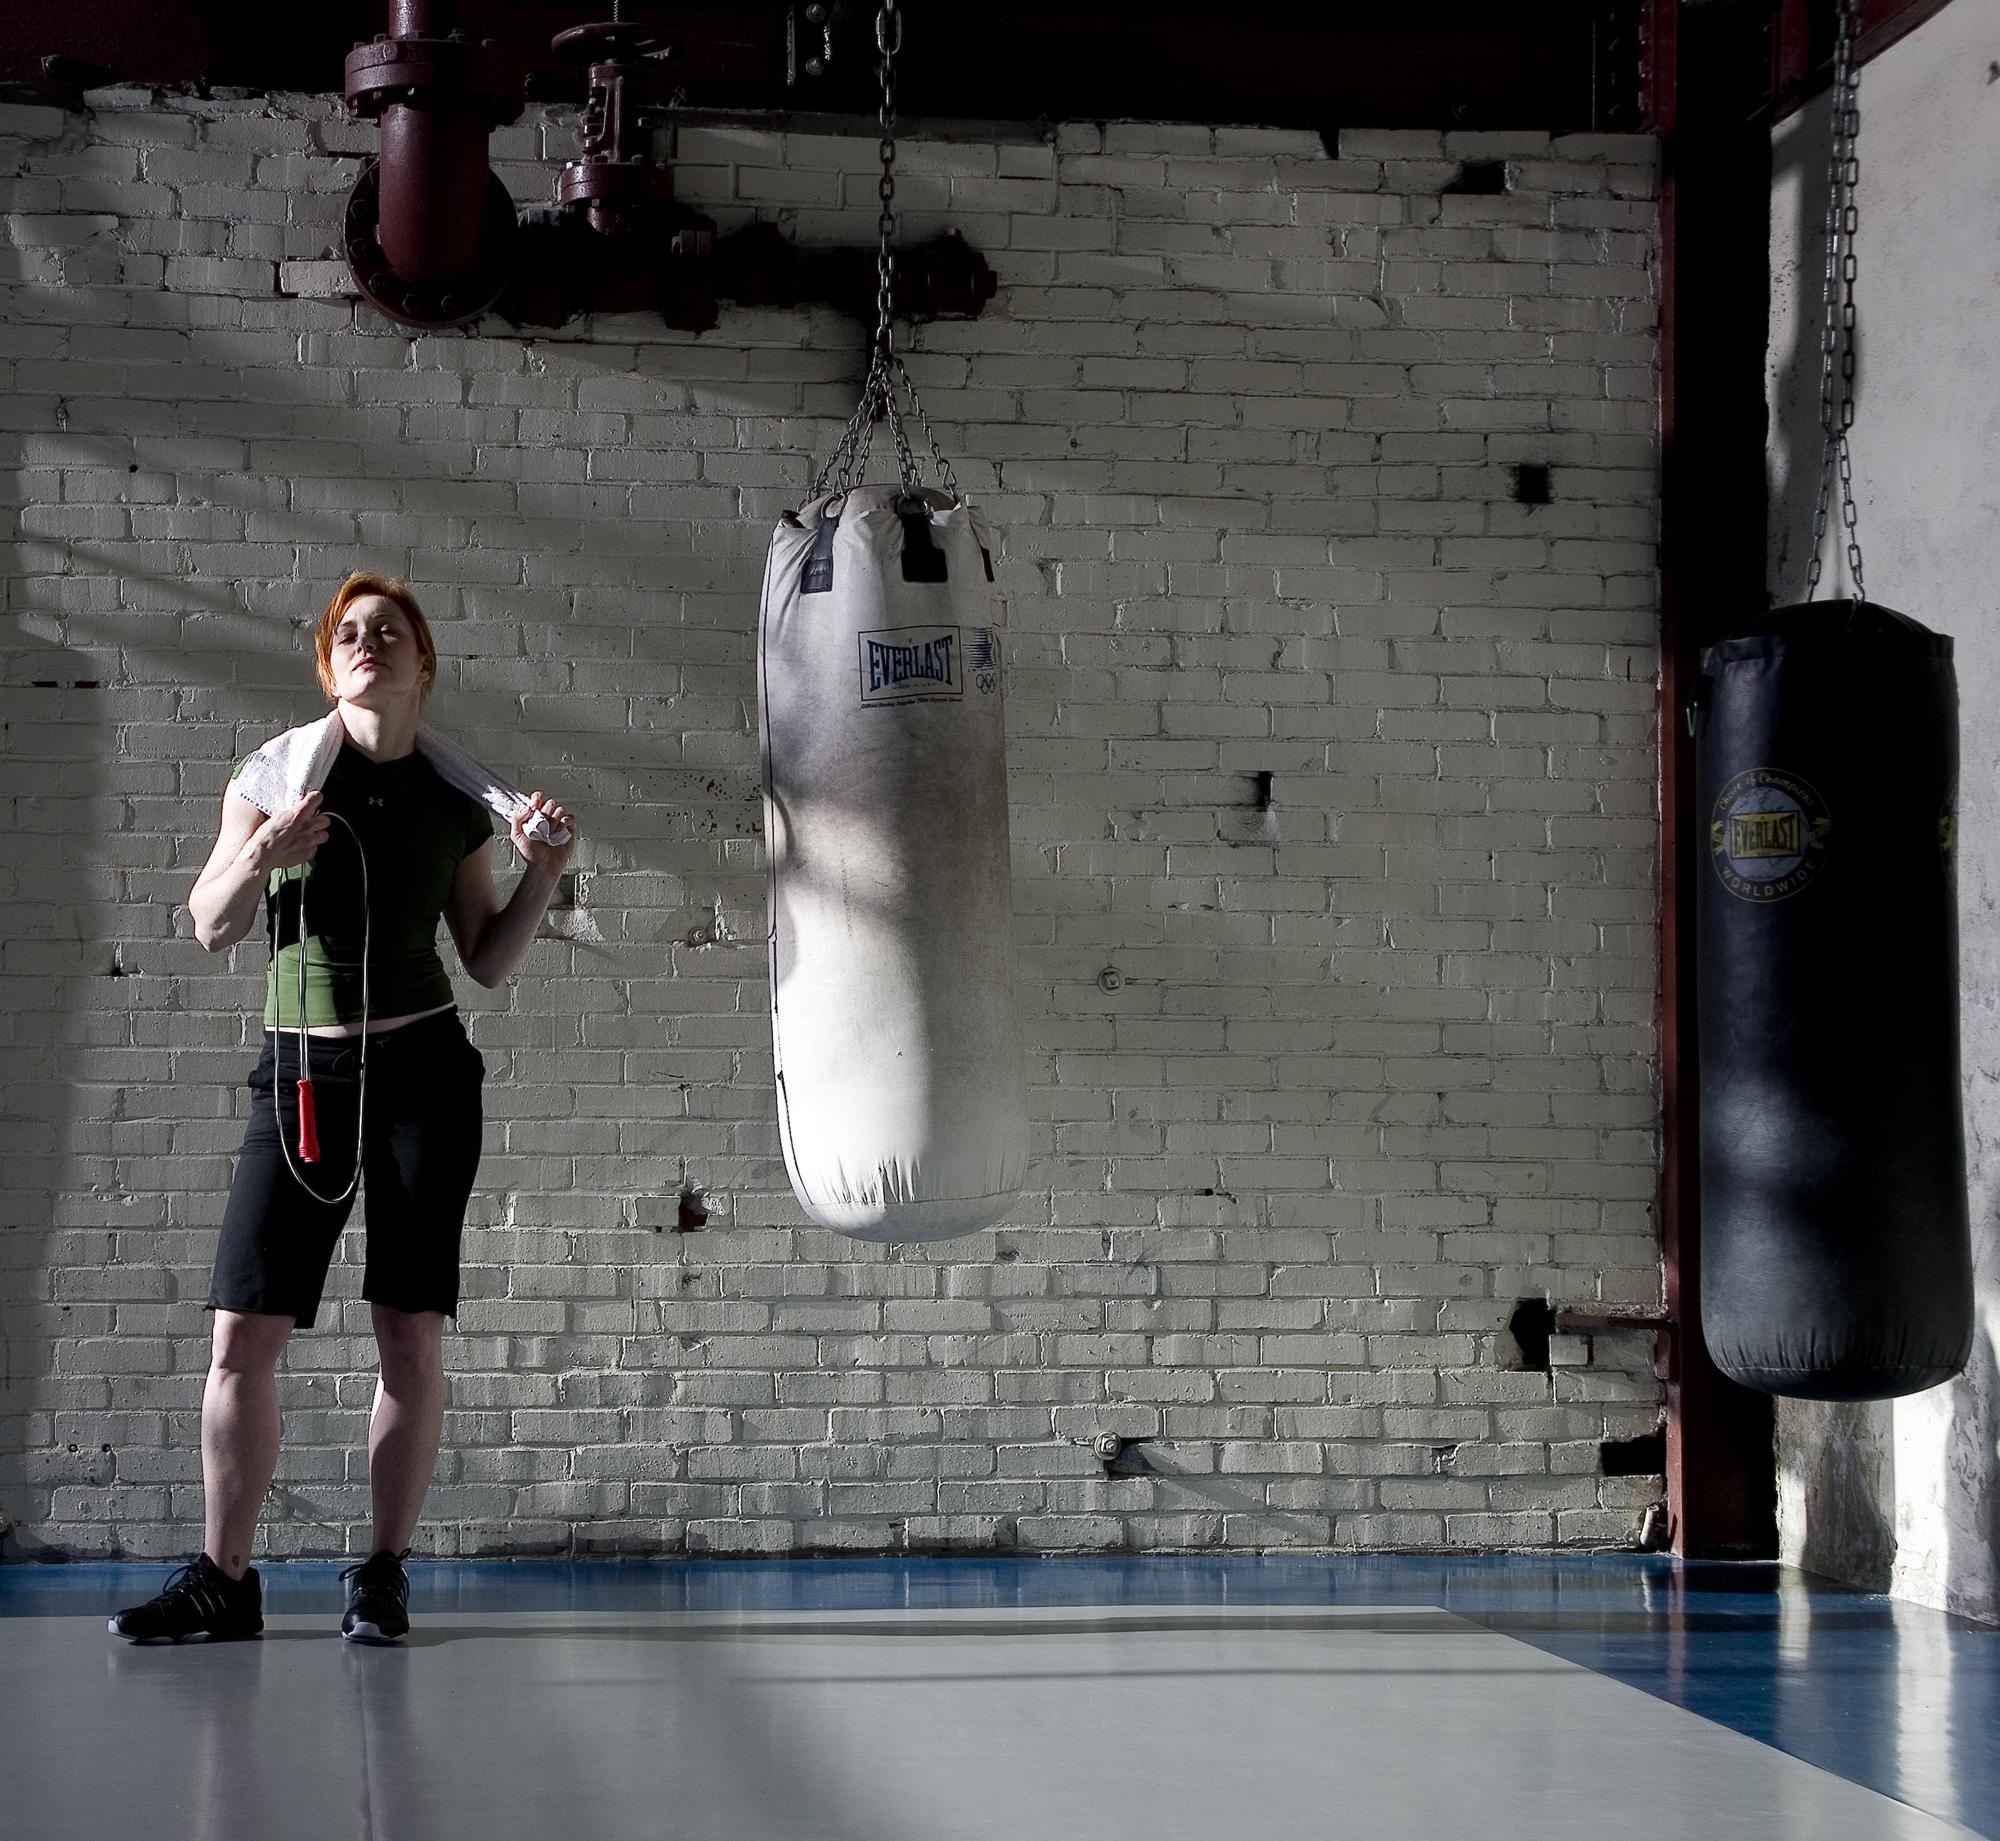 Rick Davis Photographic, Philadelphia, Still Life, Photography, Still Life Photography, Lifestyle, workout, exercise